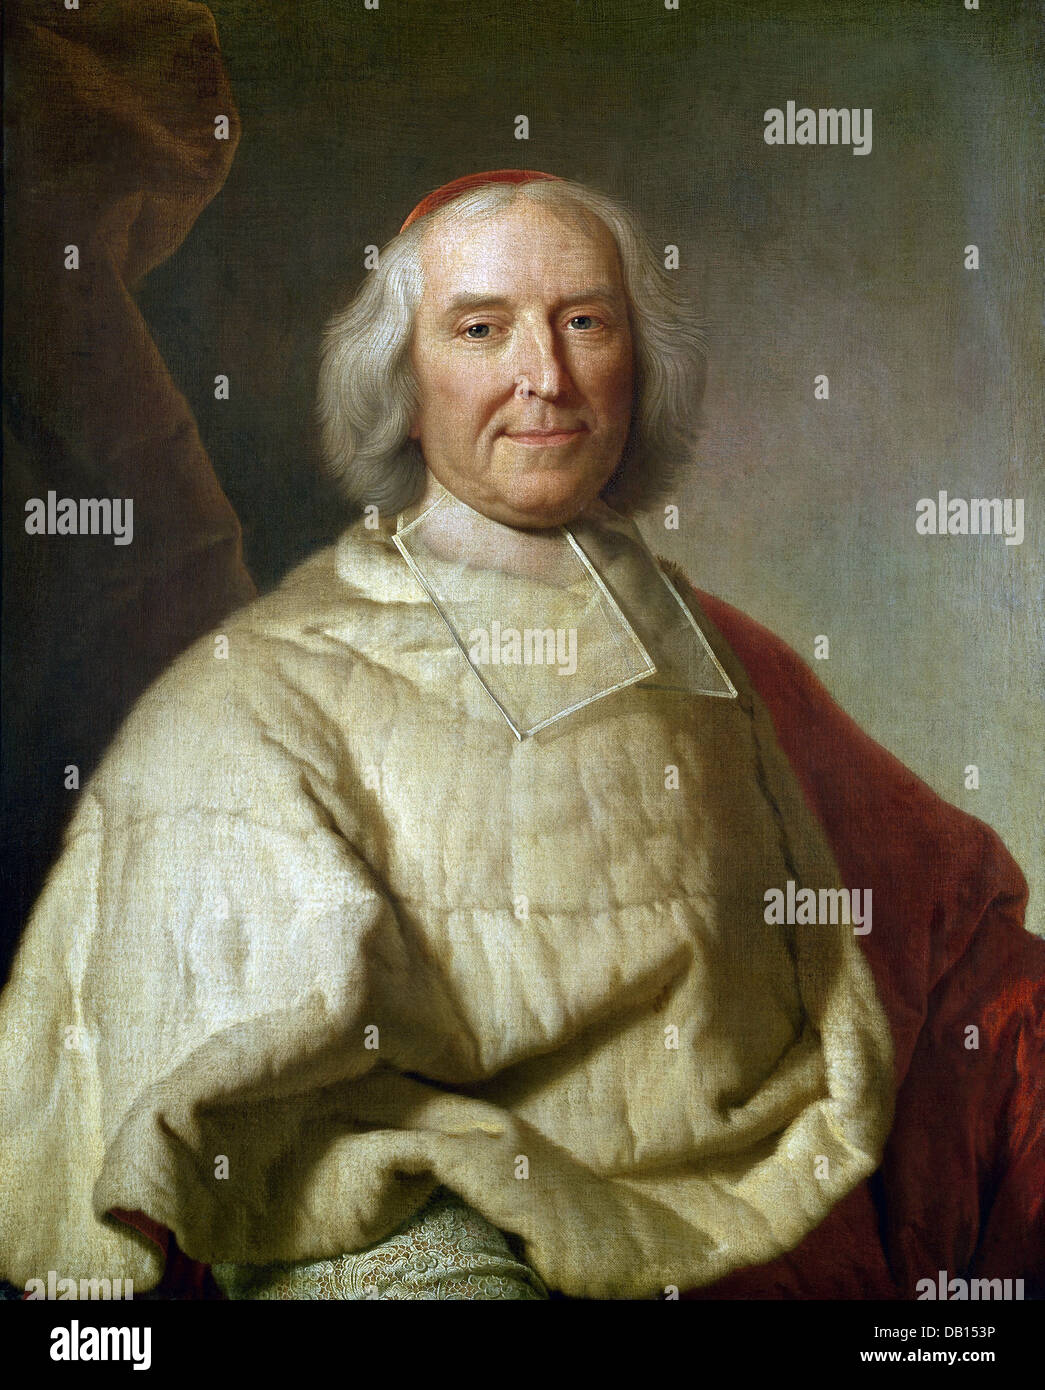 Hyacinthe Rigaud André Hercule, cardinal de Fleury National Gallery London - Stock Image